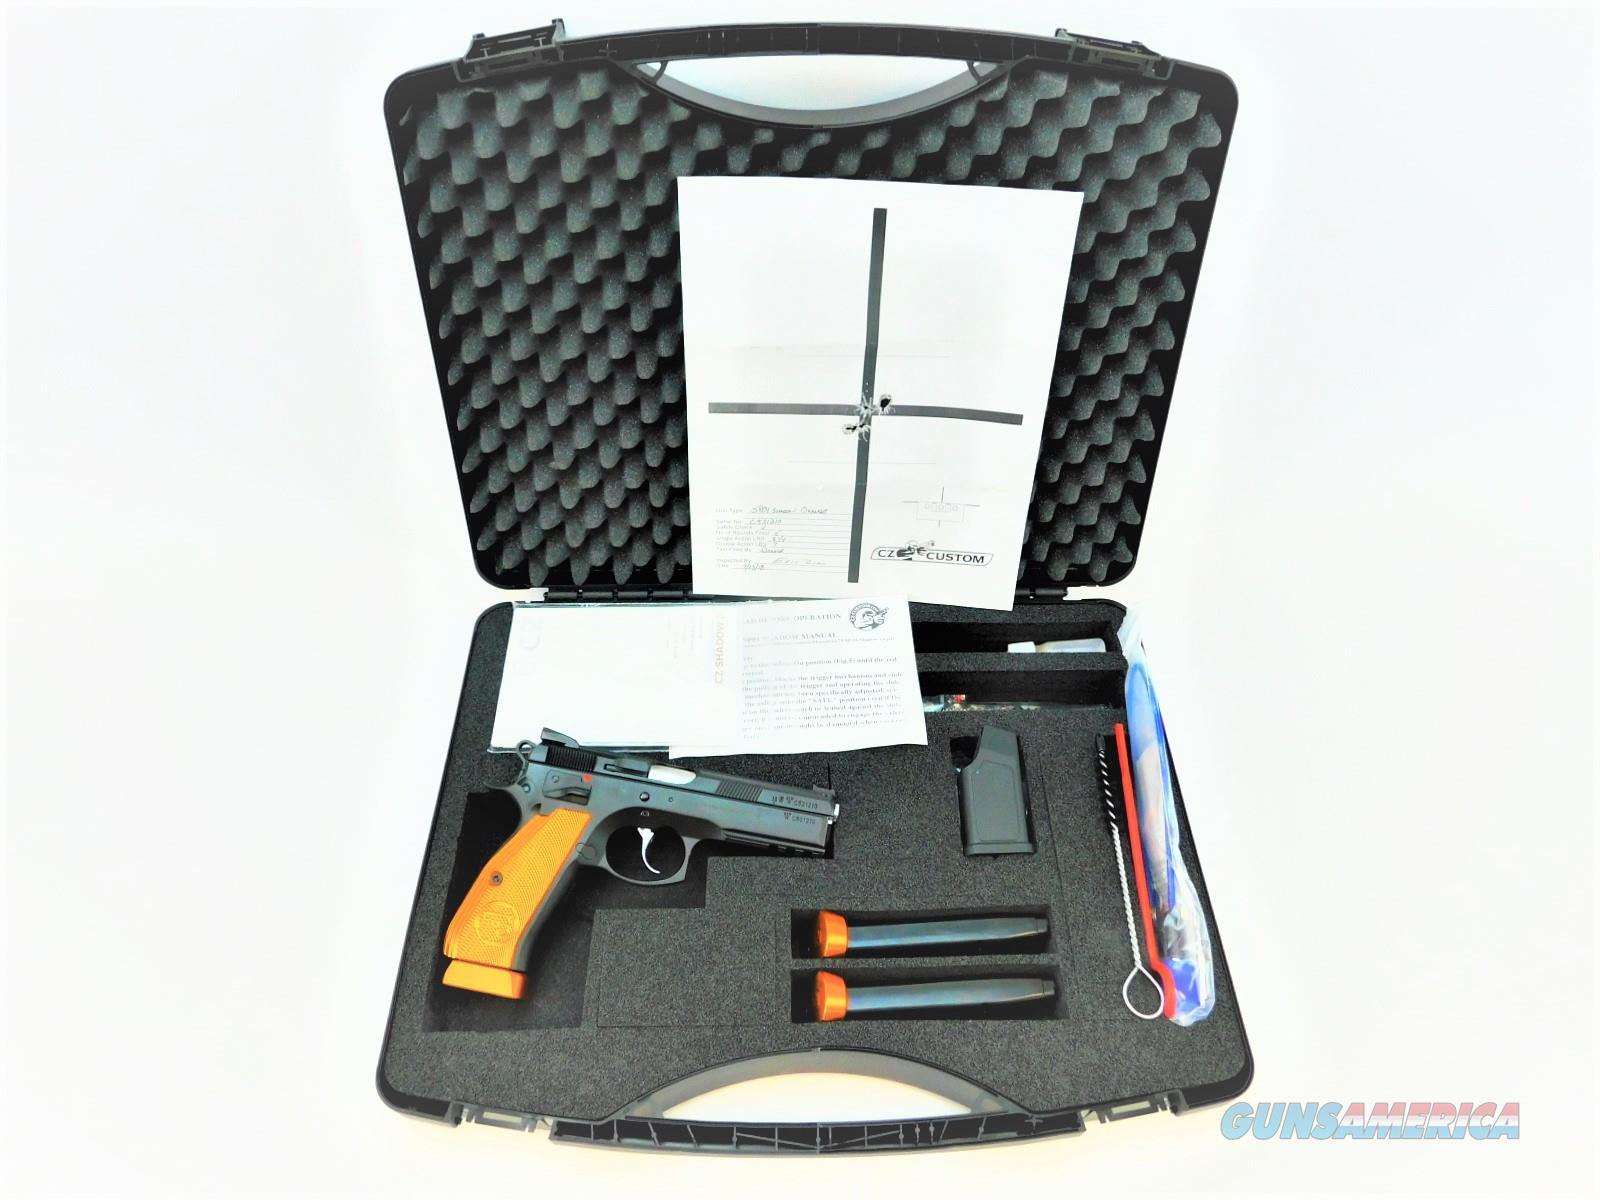 CZ-USA CZ CUSTOM SHOP 75 SP-01 SHADOW ORANGE 9MM LUGER SKU: 91764  Guns > Pistols > CZ Pistols